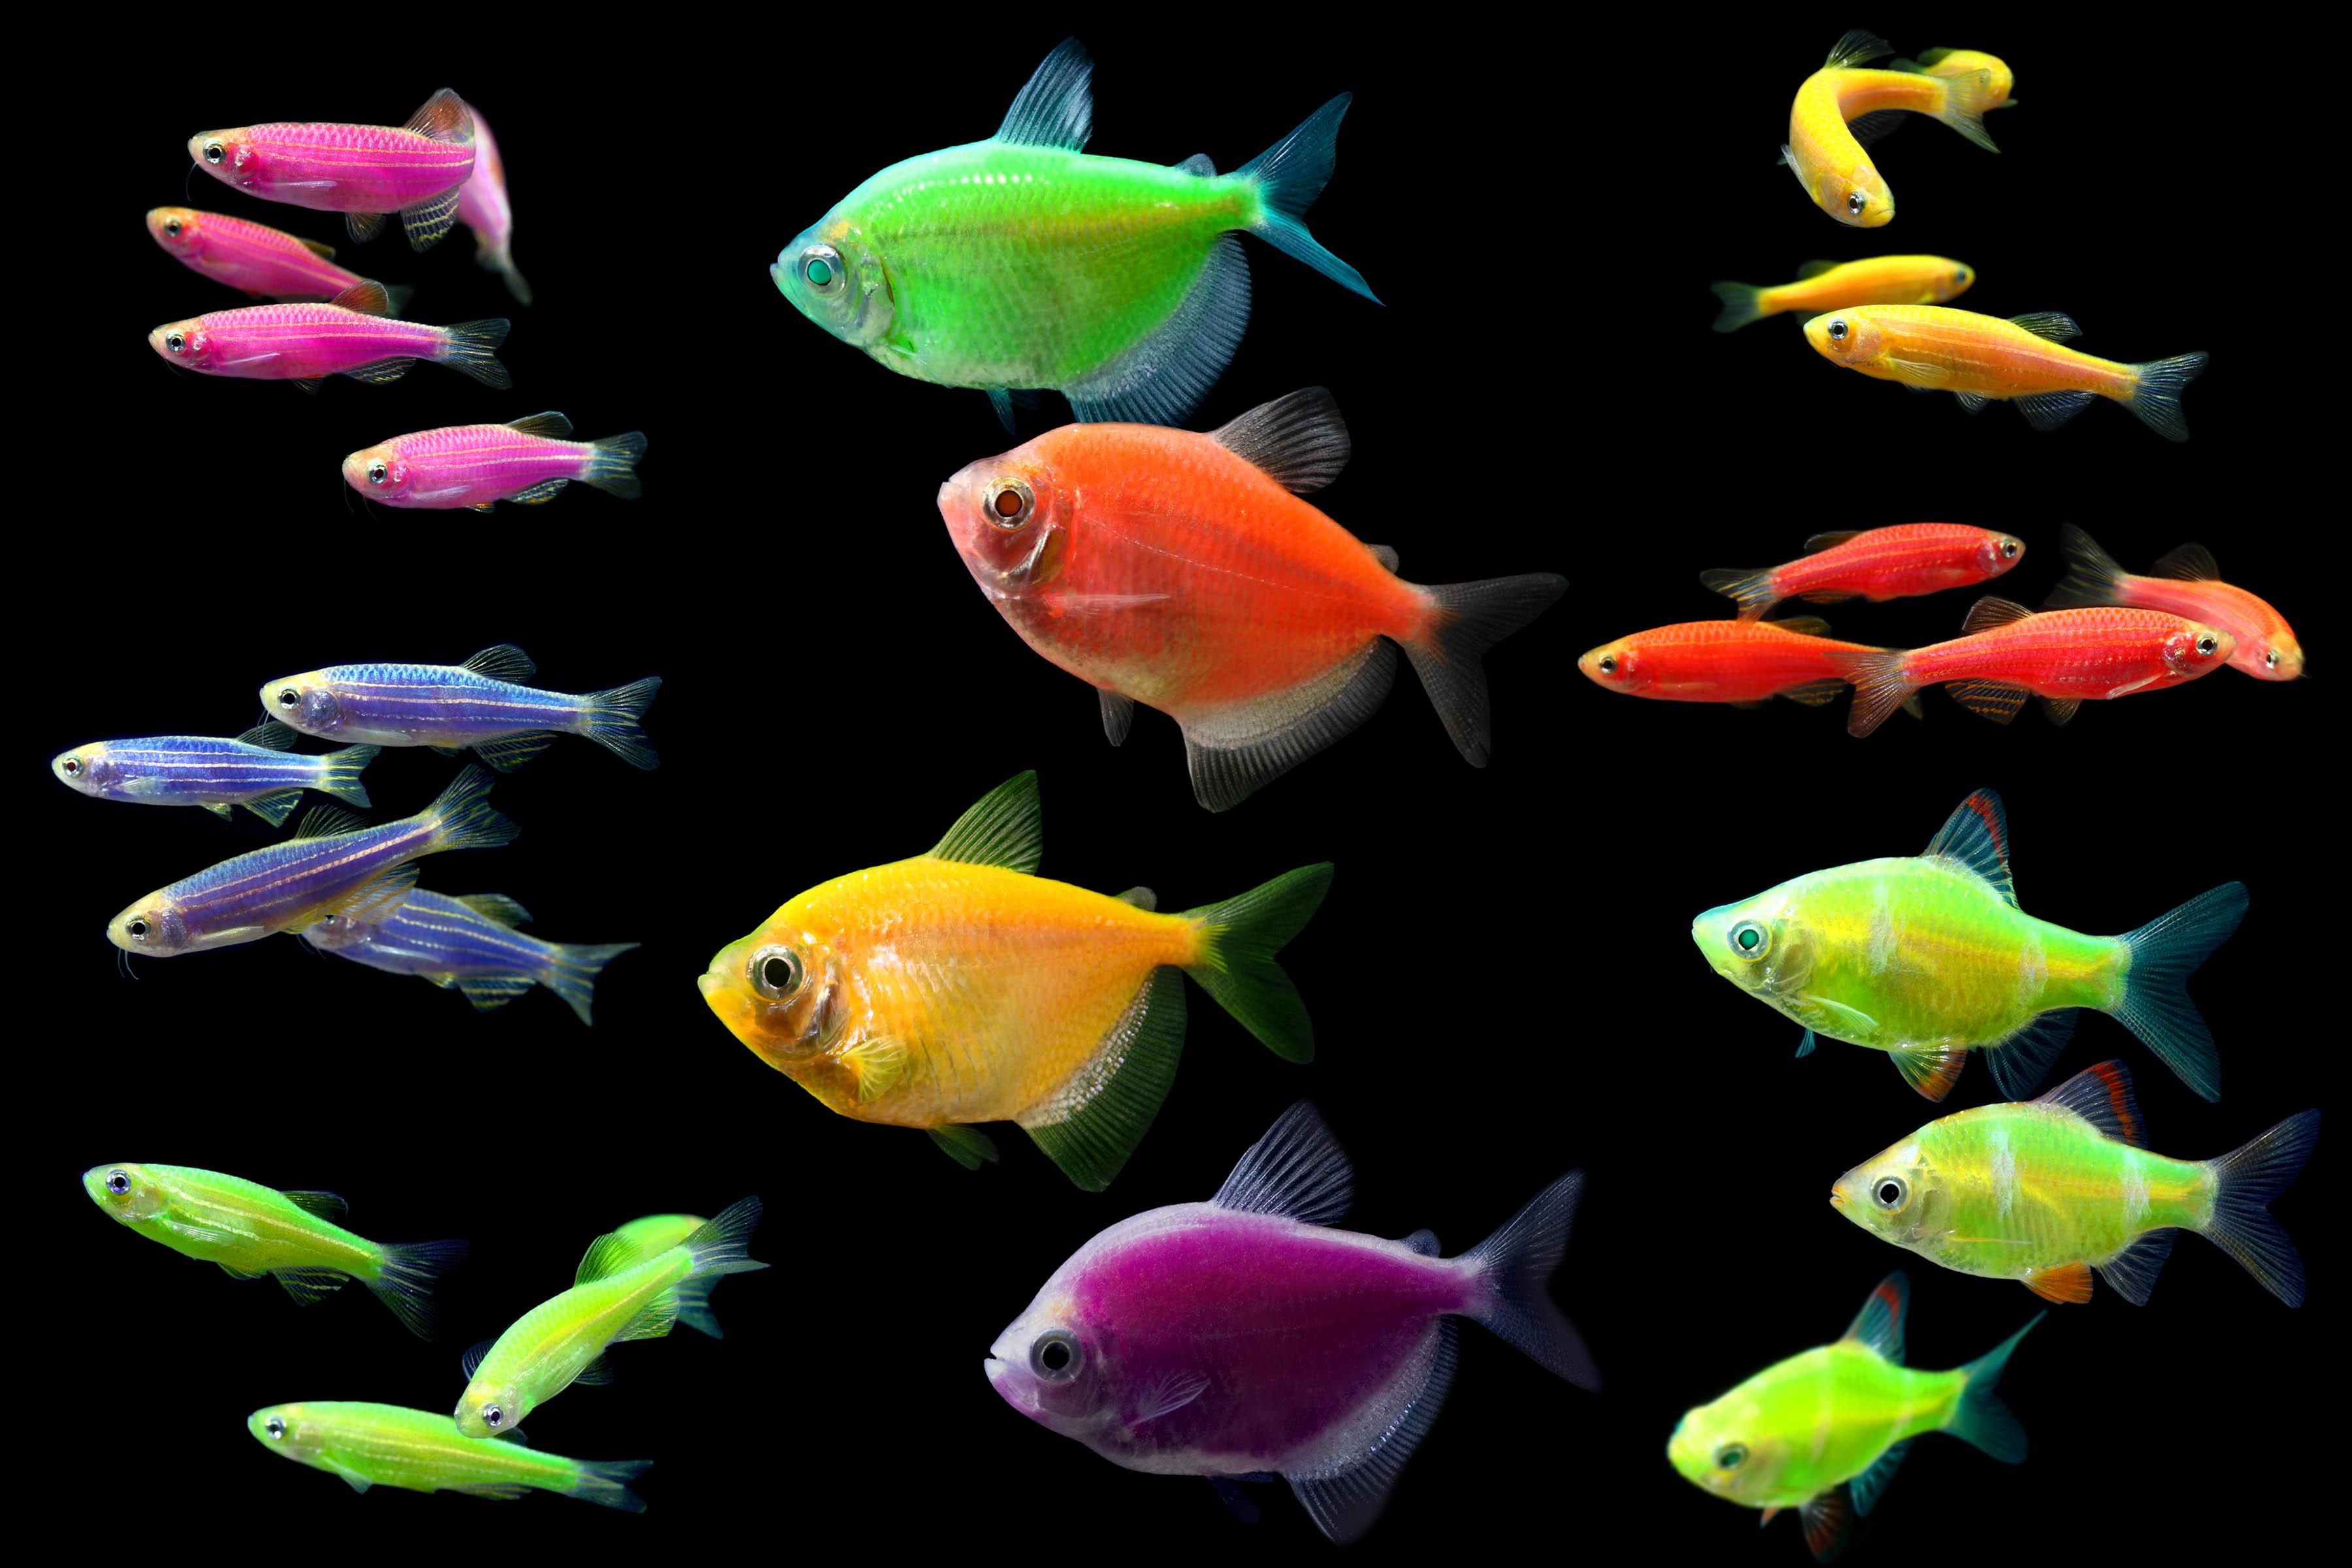 Freshwater aquarium fish neon - Freshwater Aquarium Fish Neon